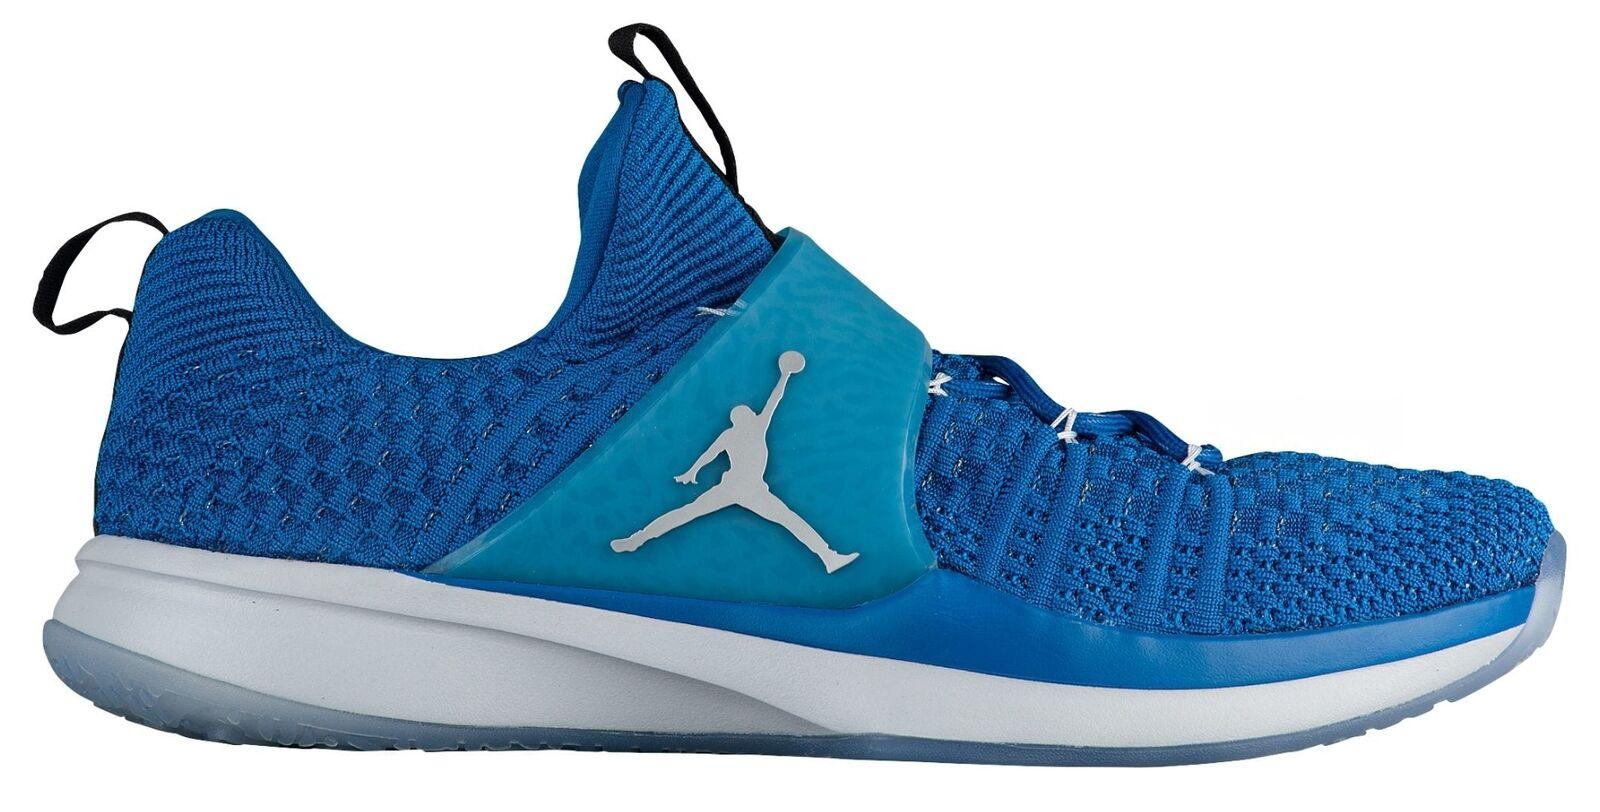 Jordan Trainer 2 Flyknit Mens 921210-402 Military Blue 15 Training Shoes Size 15 Blue 95408c